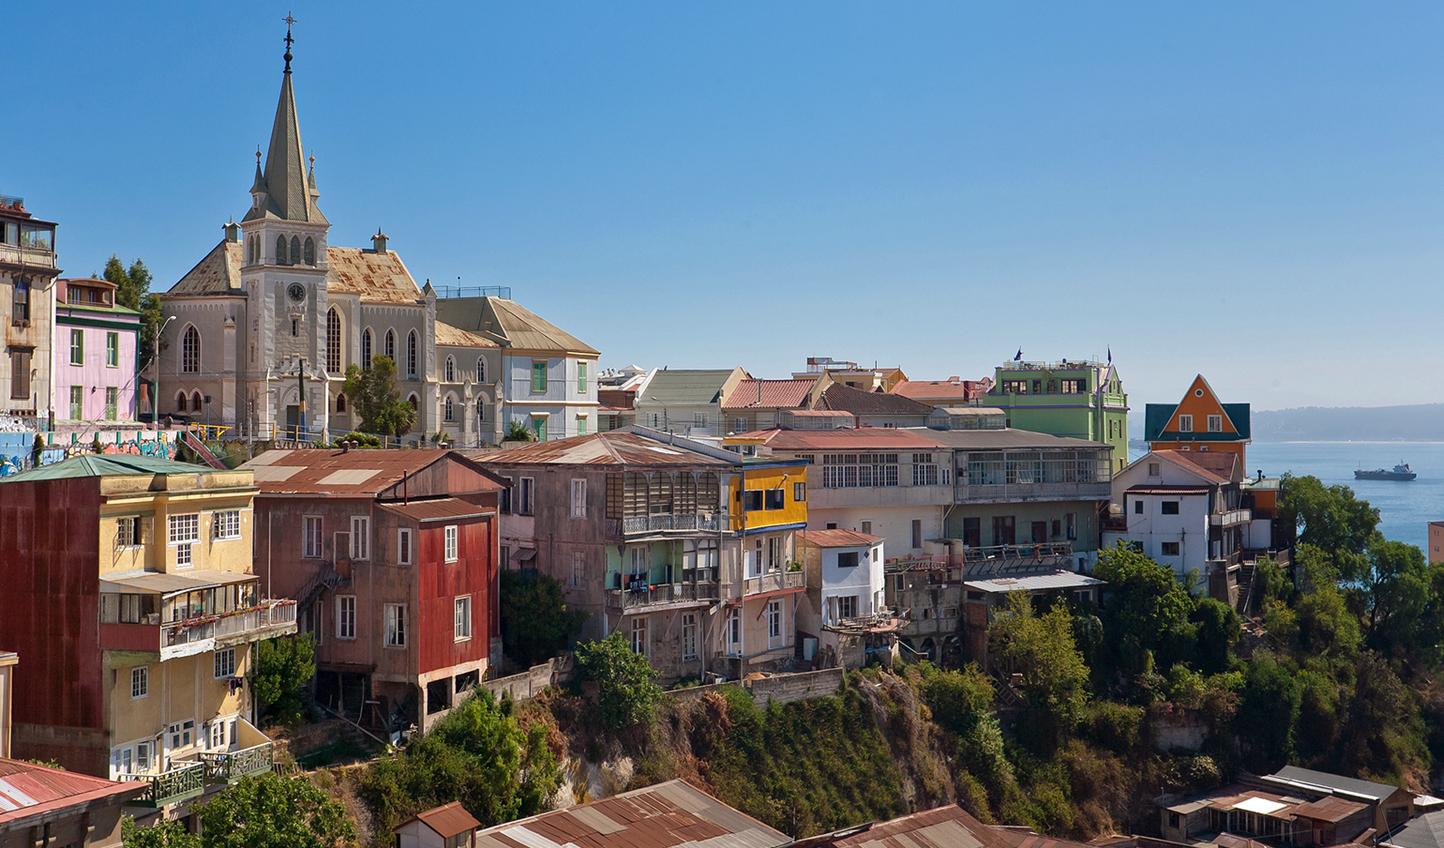 Valparaiso, a UNESCO world heritage city